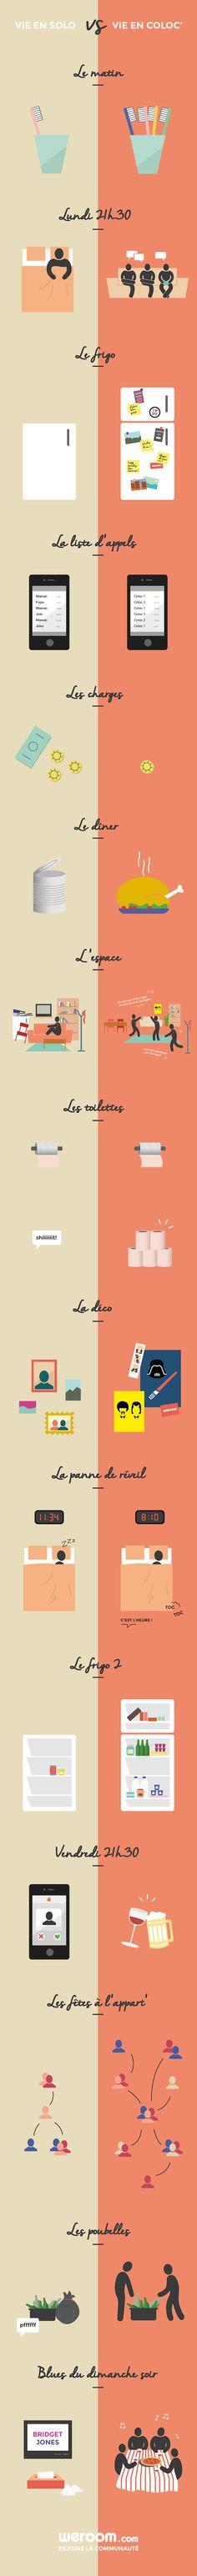 infographie SOLO vs COLOC via @iletaitunepub http://iletaitunepub.fr/2014/12/16/infographie-la-vie-solo-vs-la-vie-en-coloc/